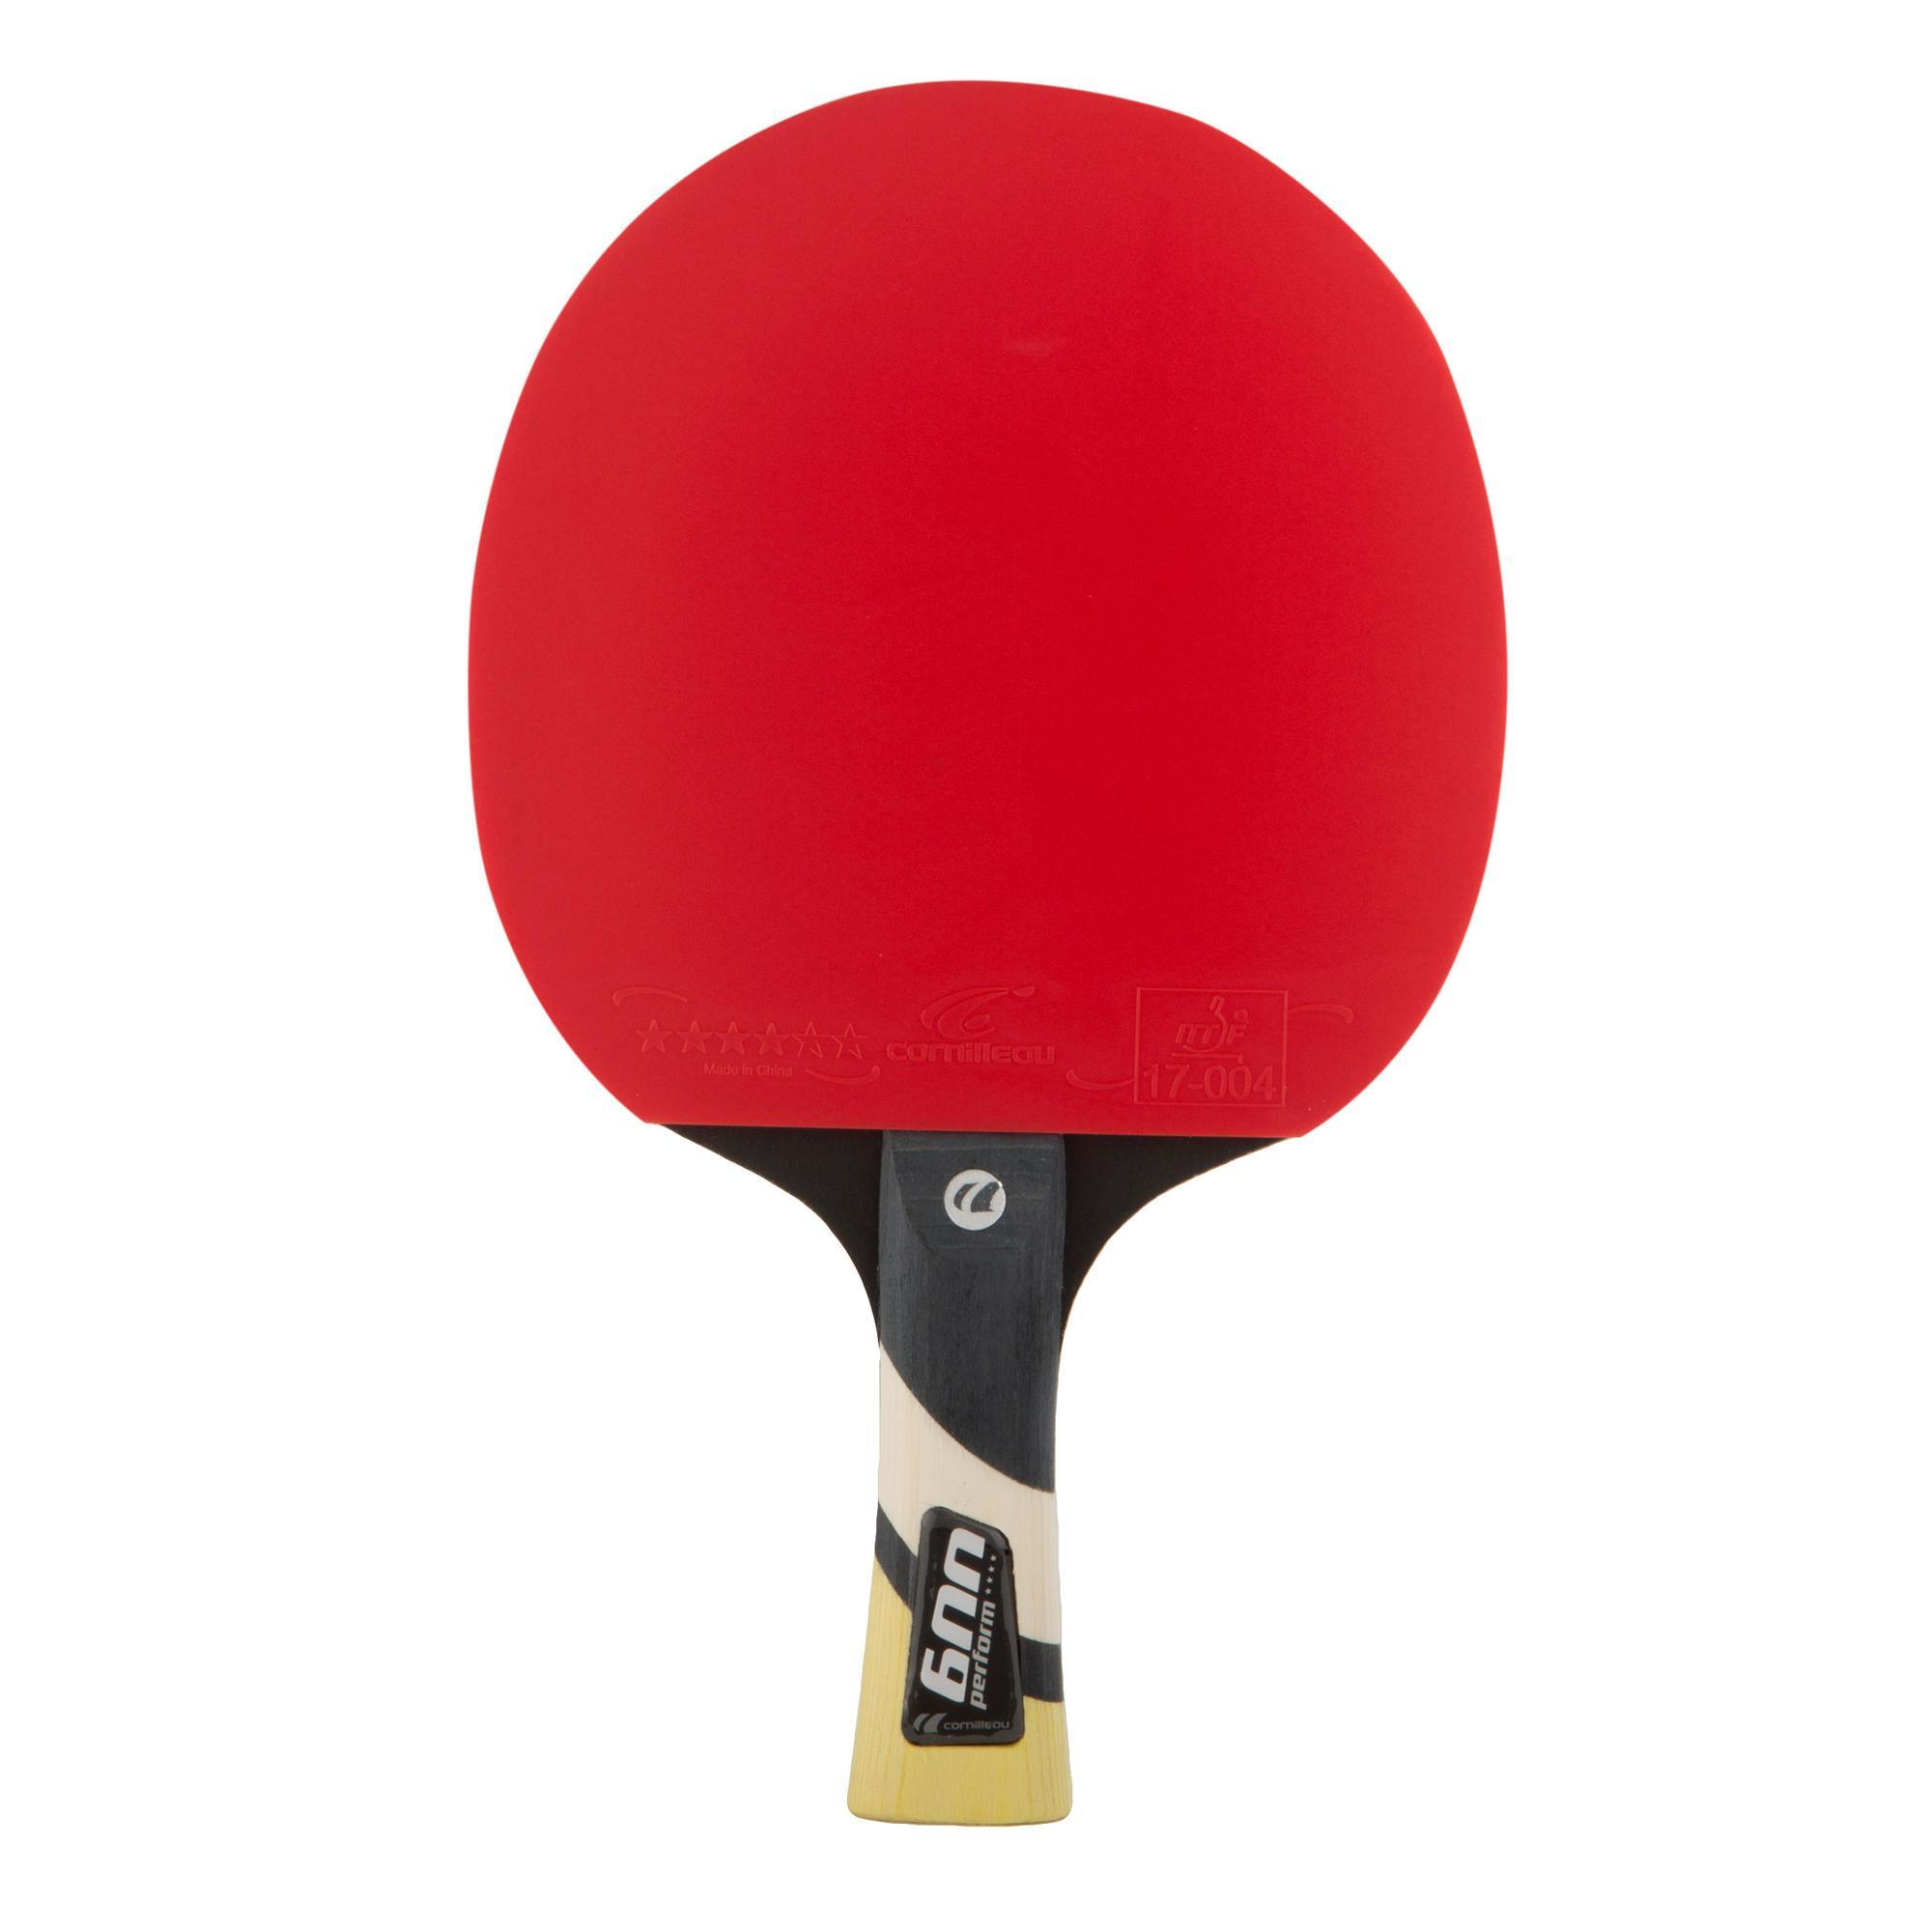 Cornilleau raquette de tennis de table en club et en cole 600 perform 4 decathlon - Raquette de tennis de table decathlon ...